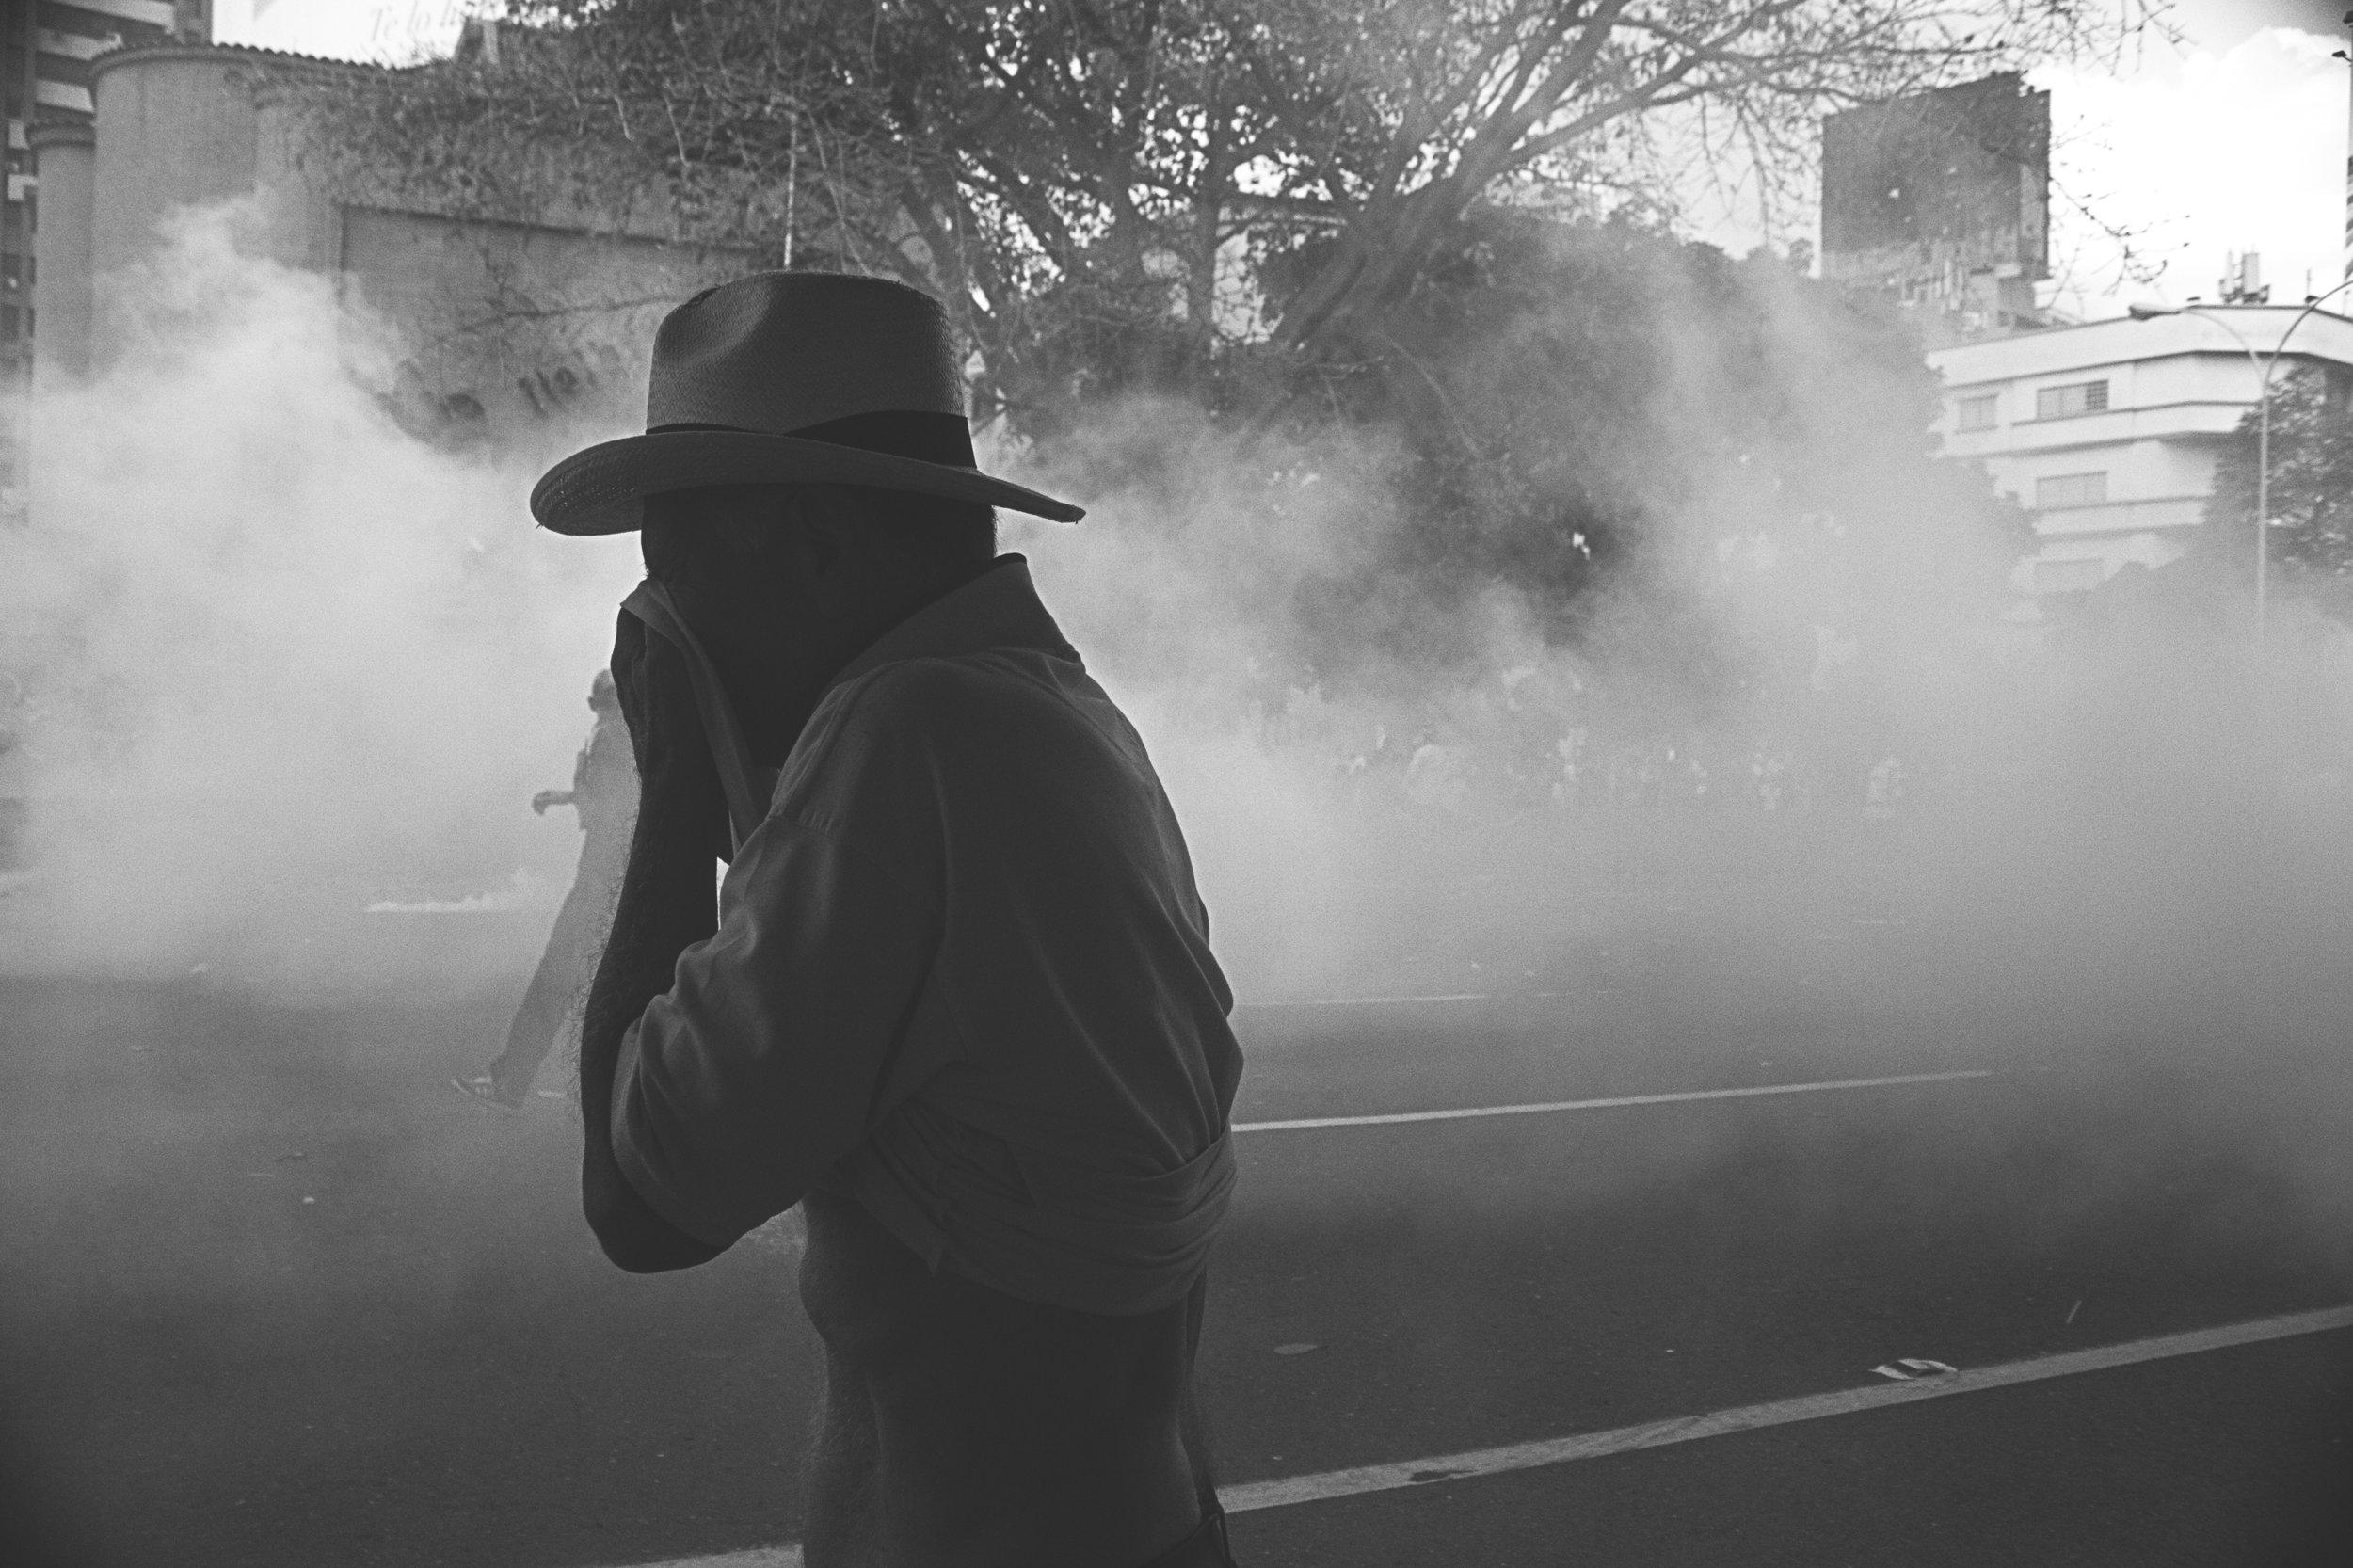 PAID - AdobeStock_144017824 - immigrant report - inhaling toxin.jpeg